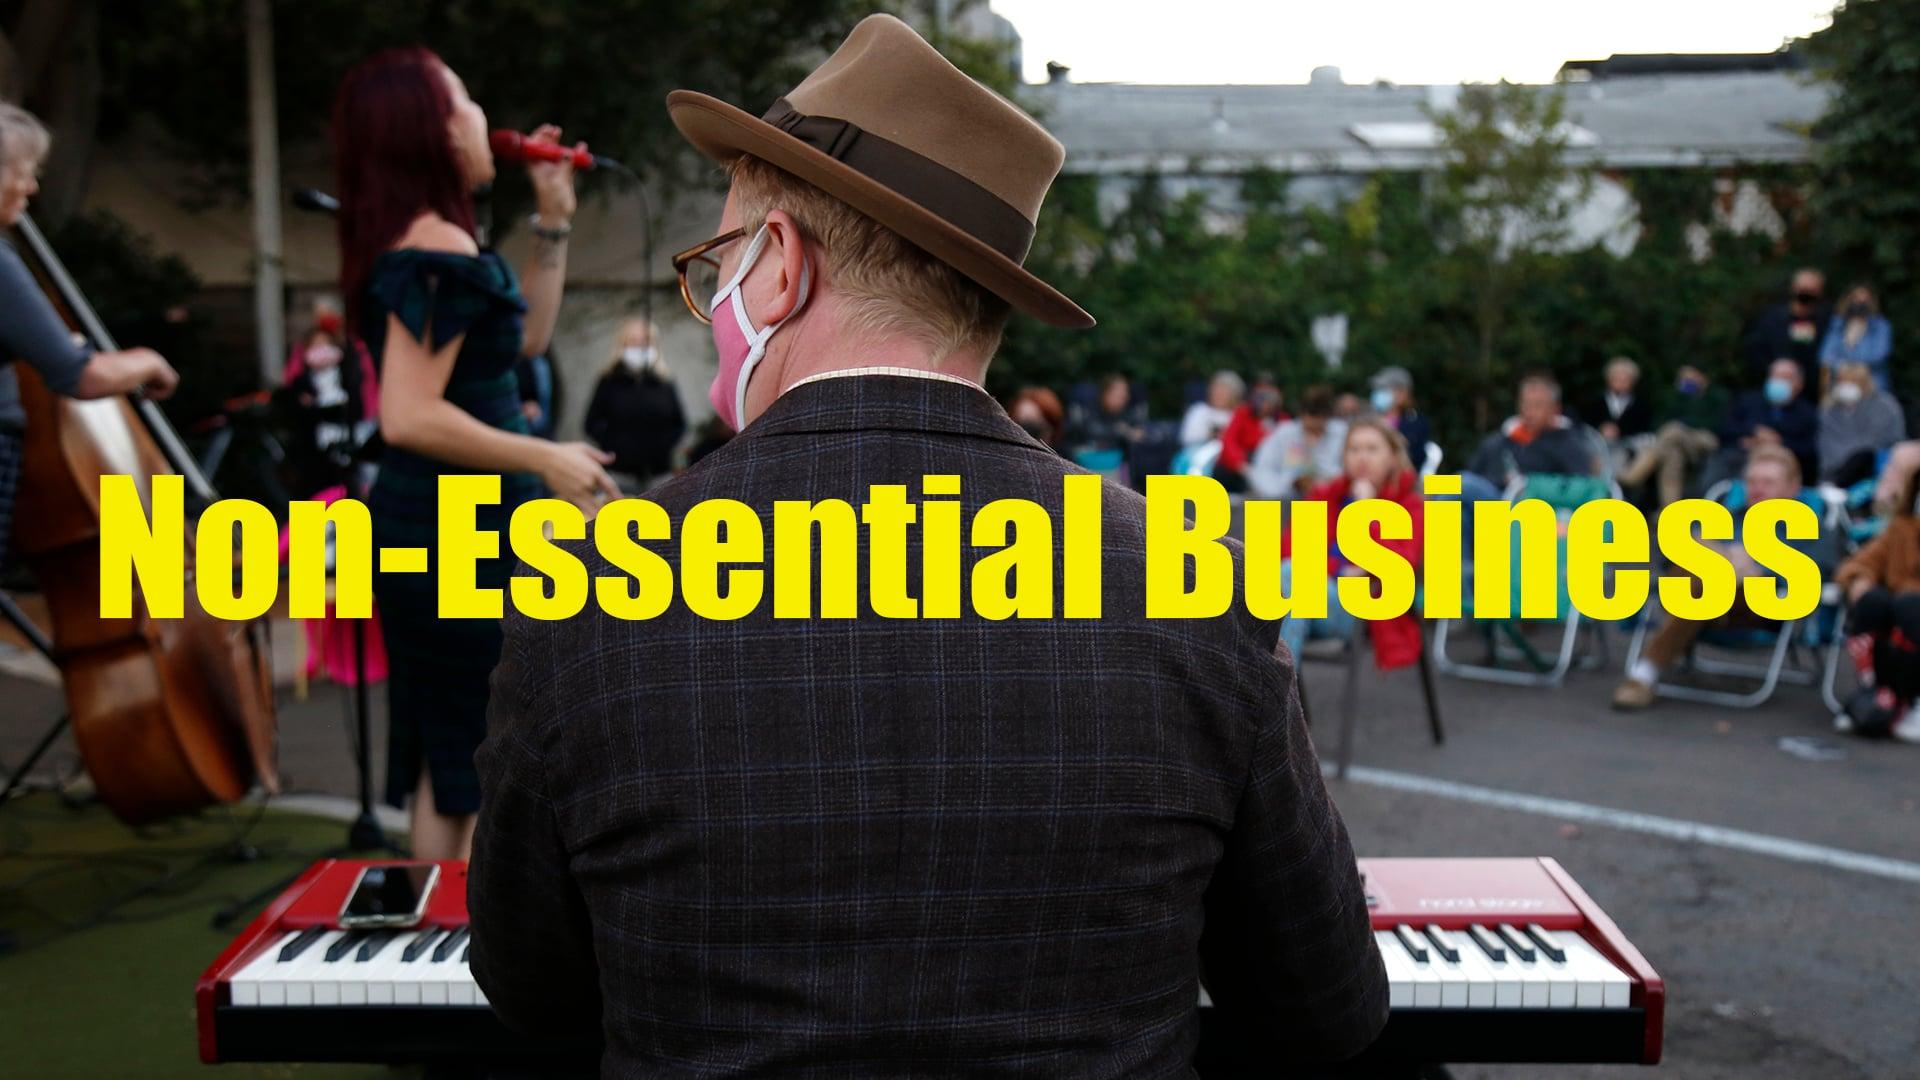 Non-Essential Business